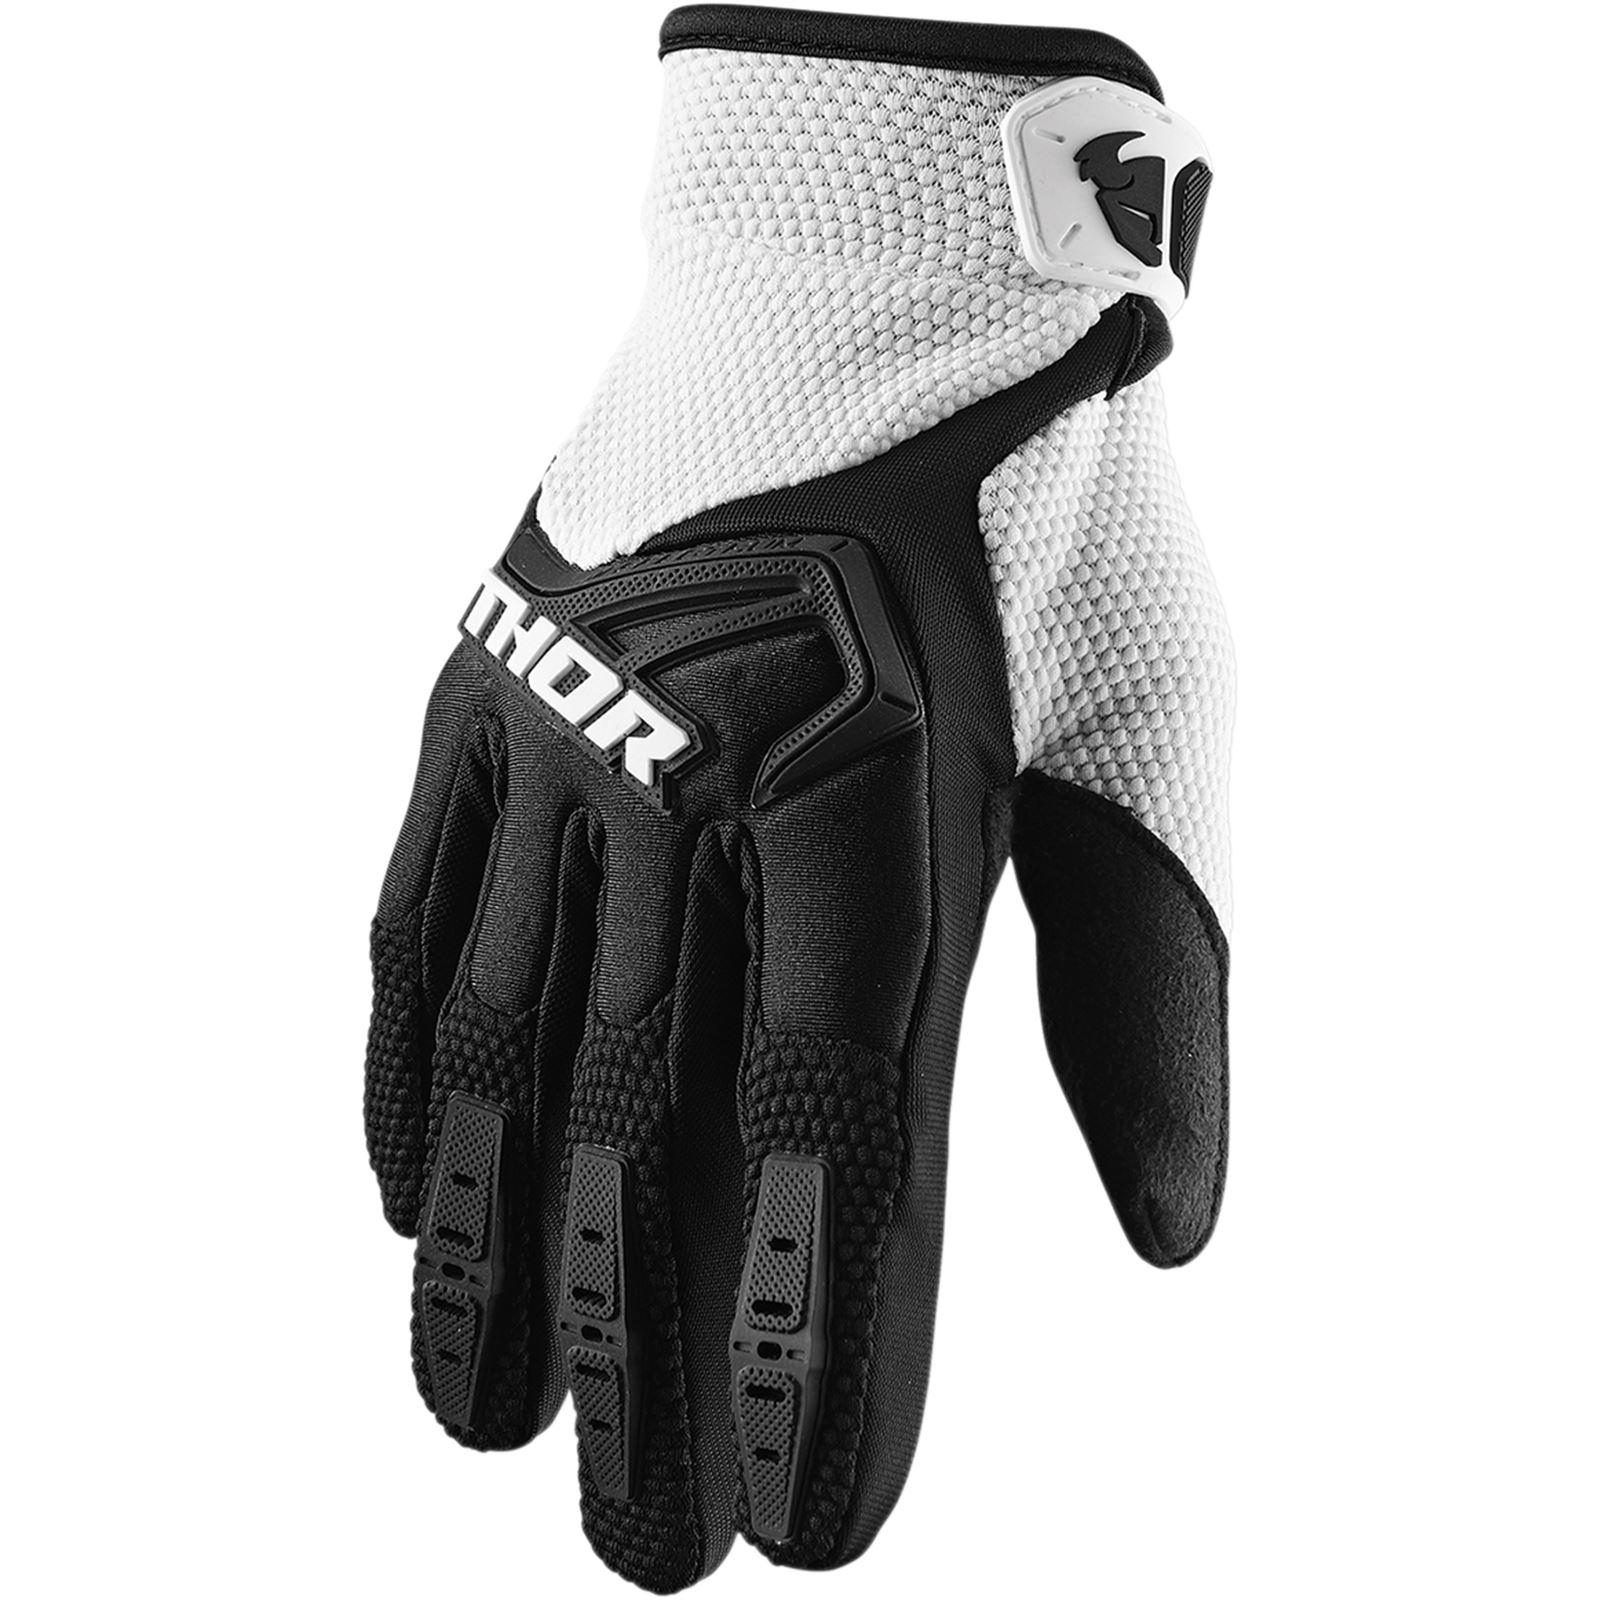 Thor Youth Spectrum Gloves Black/White - Large